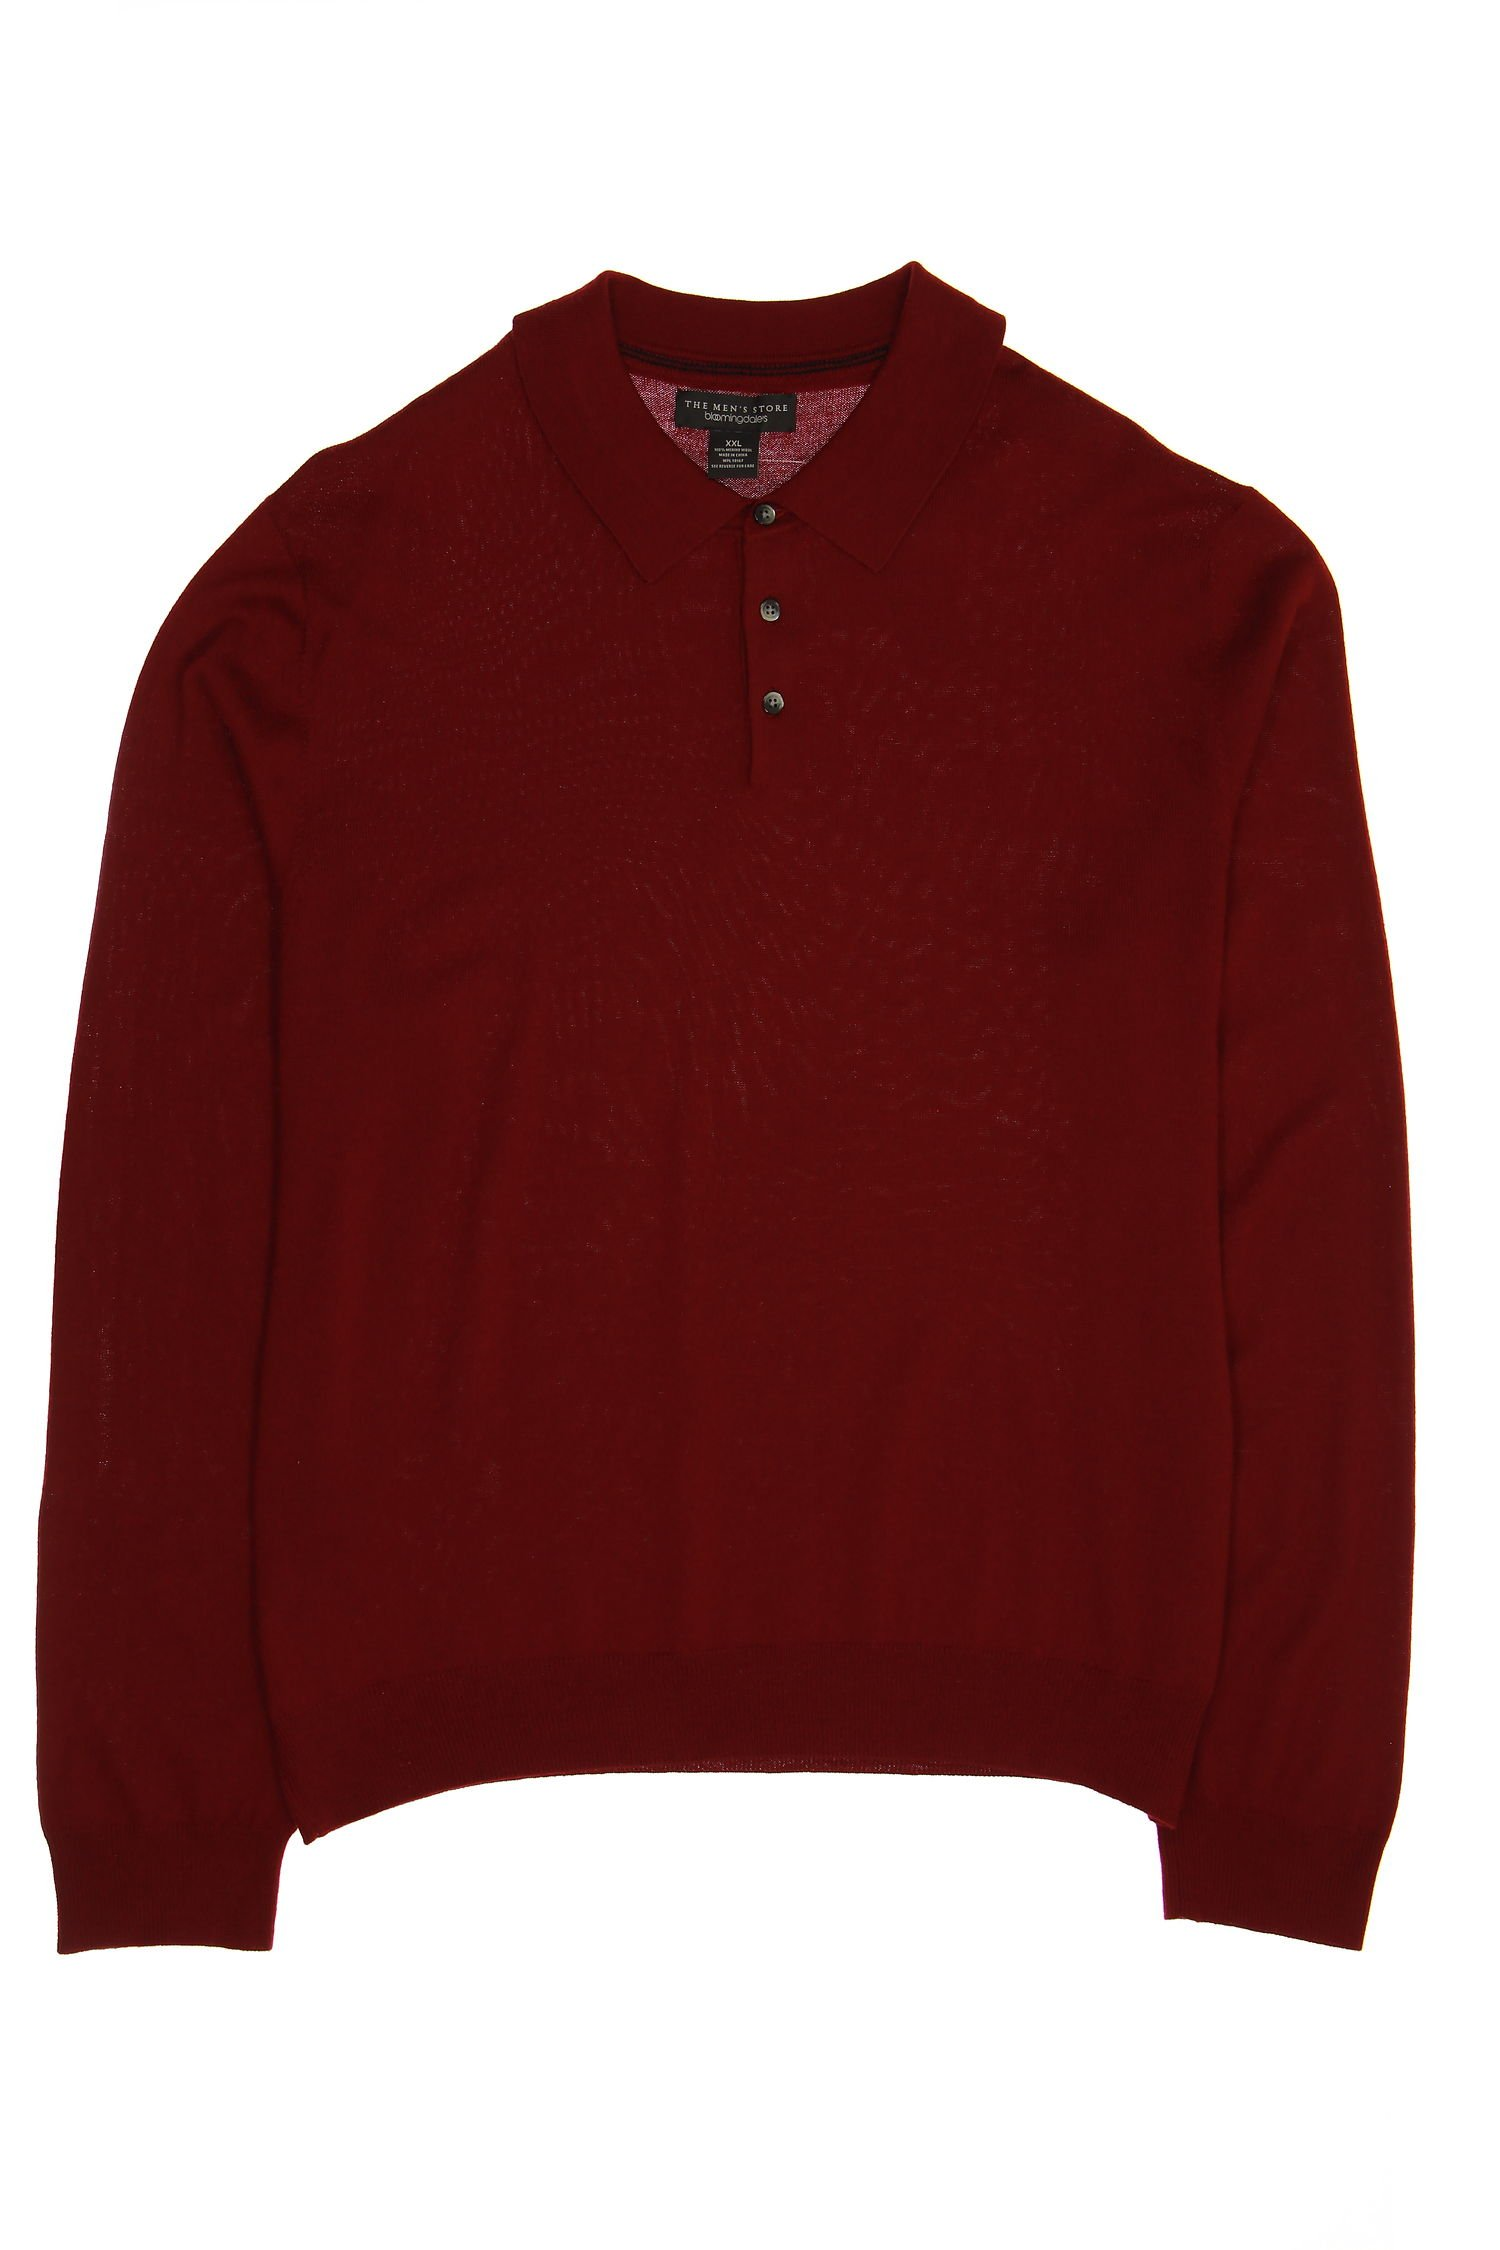 Baruffa Wine Polo Sweaters, Size 2XLarge by Baruffa